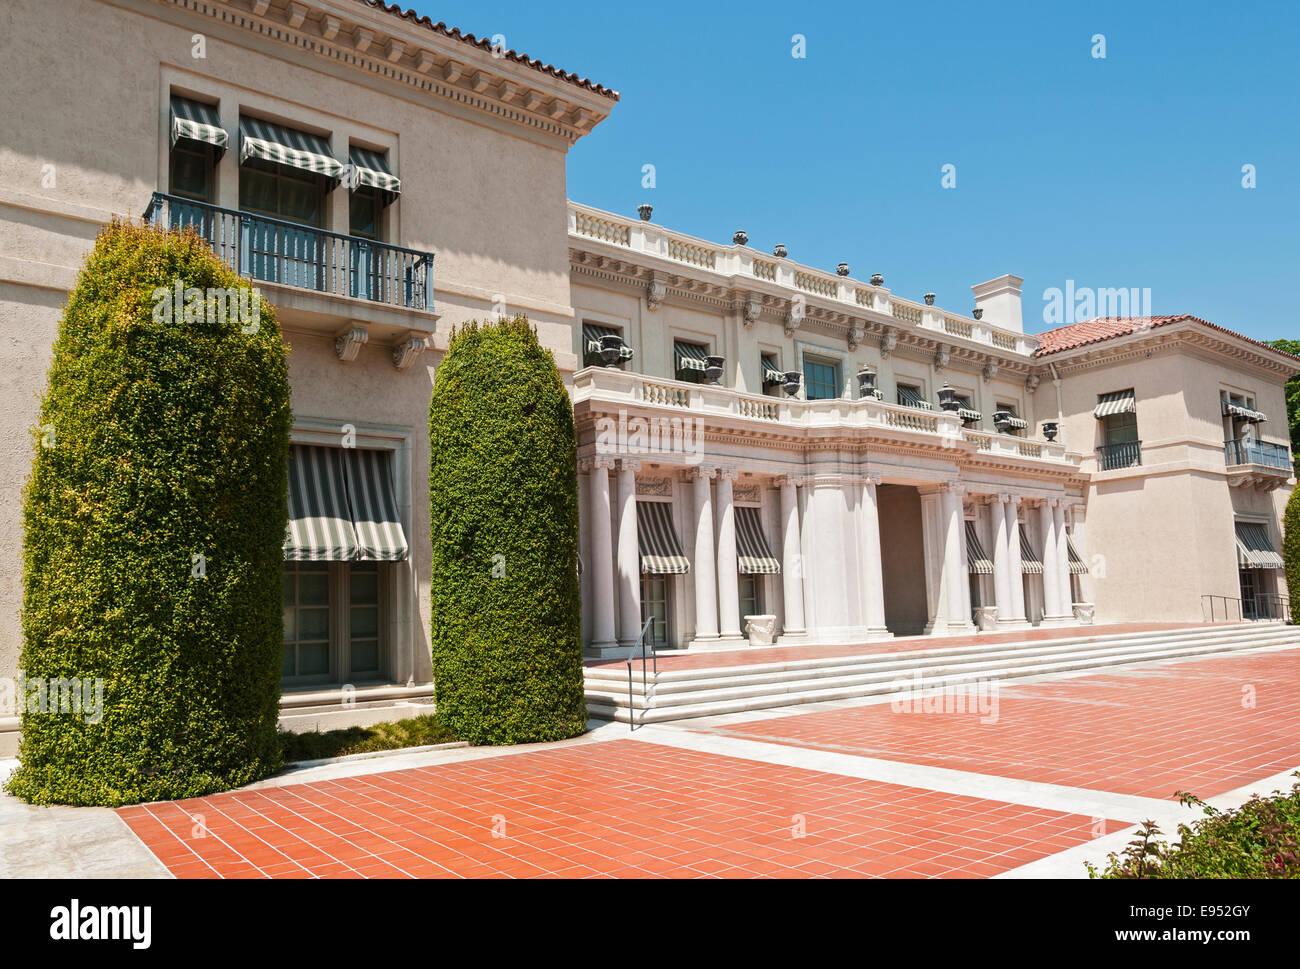 California, San Marino, The Huntington Art Gallery, exterior - Stock Image